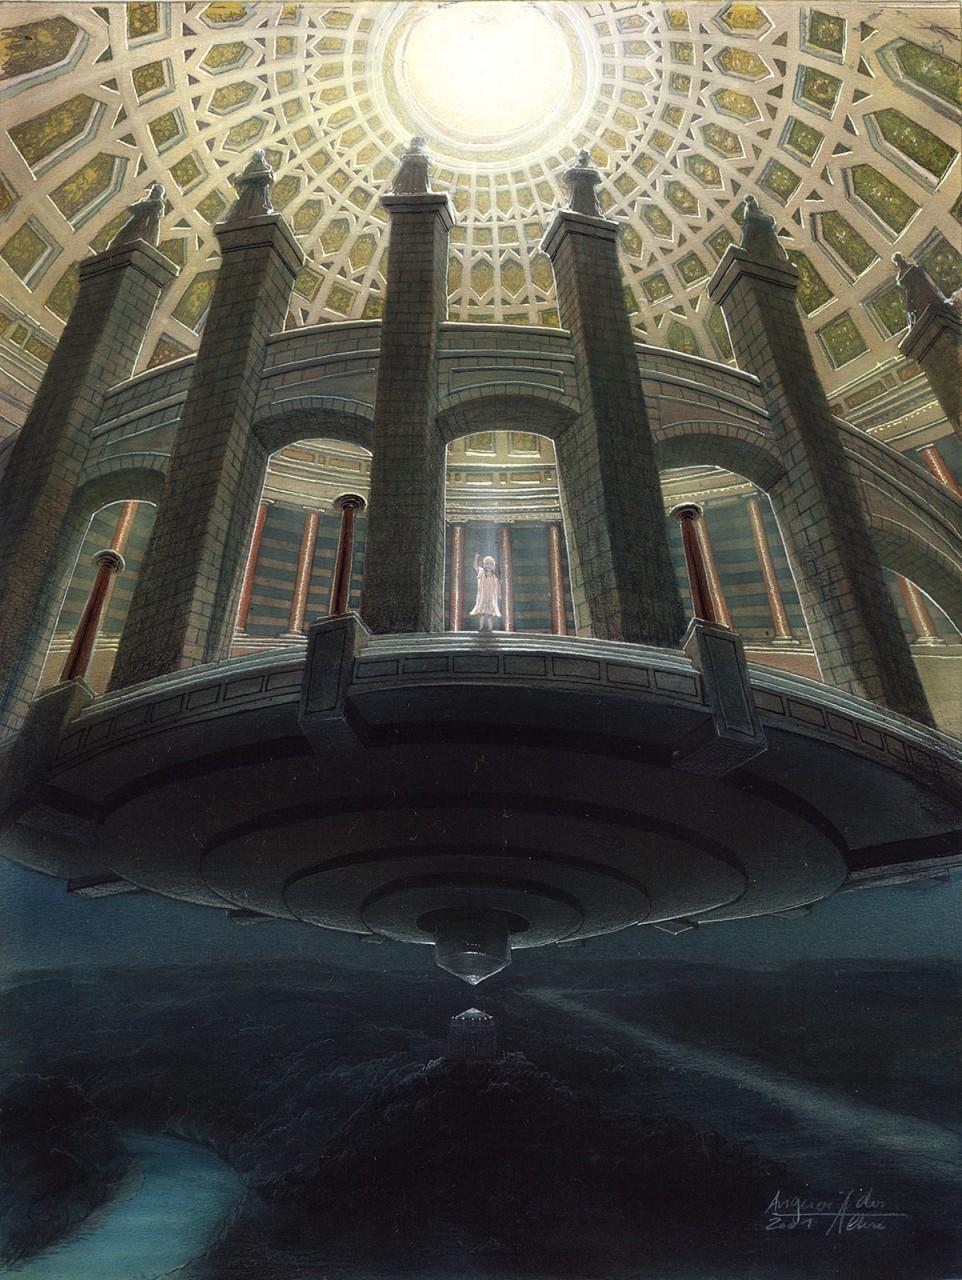 Die Befreiungshalle als Befreiungs Ufo